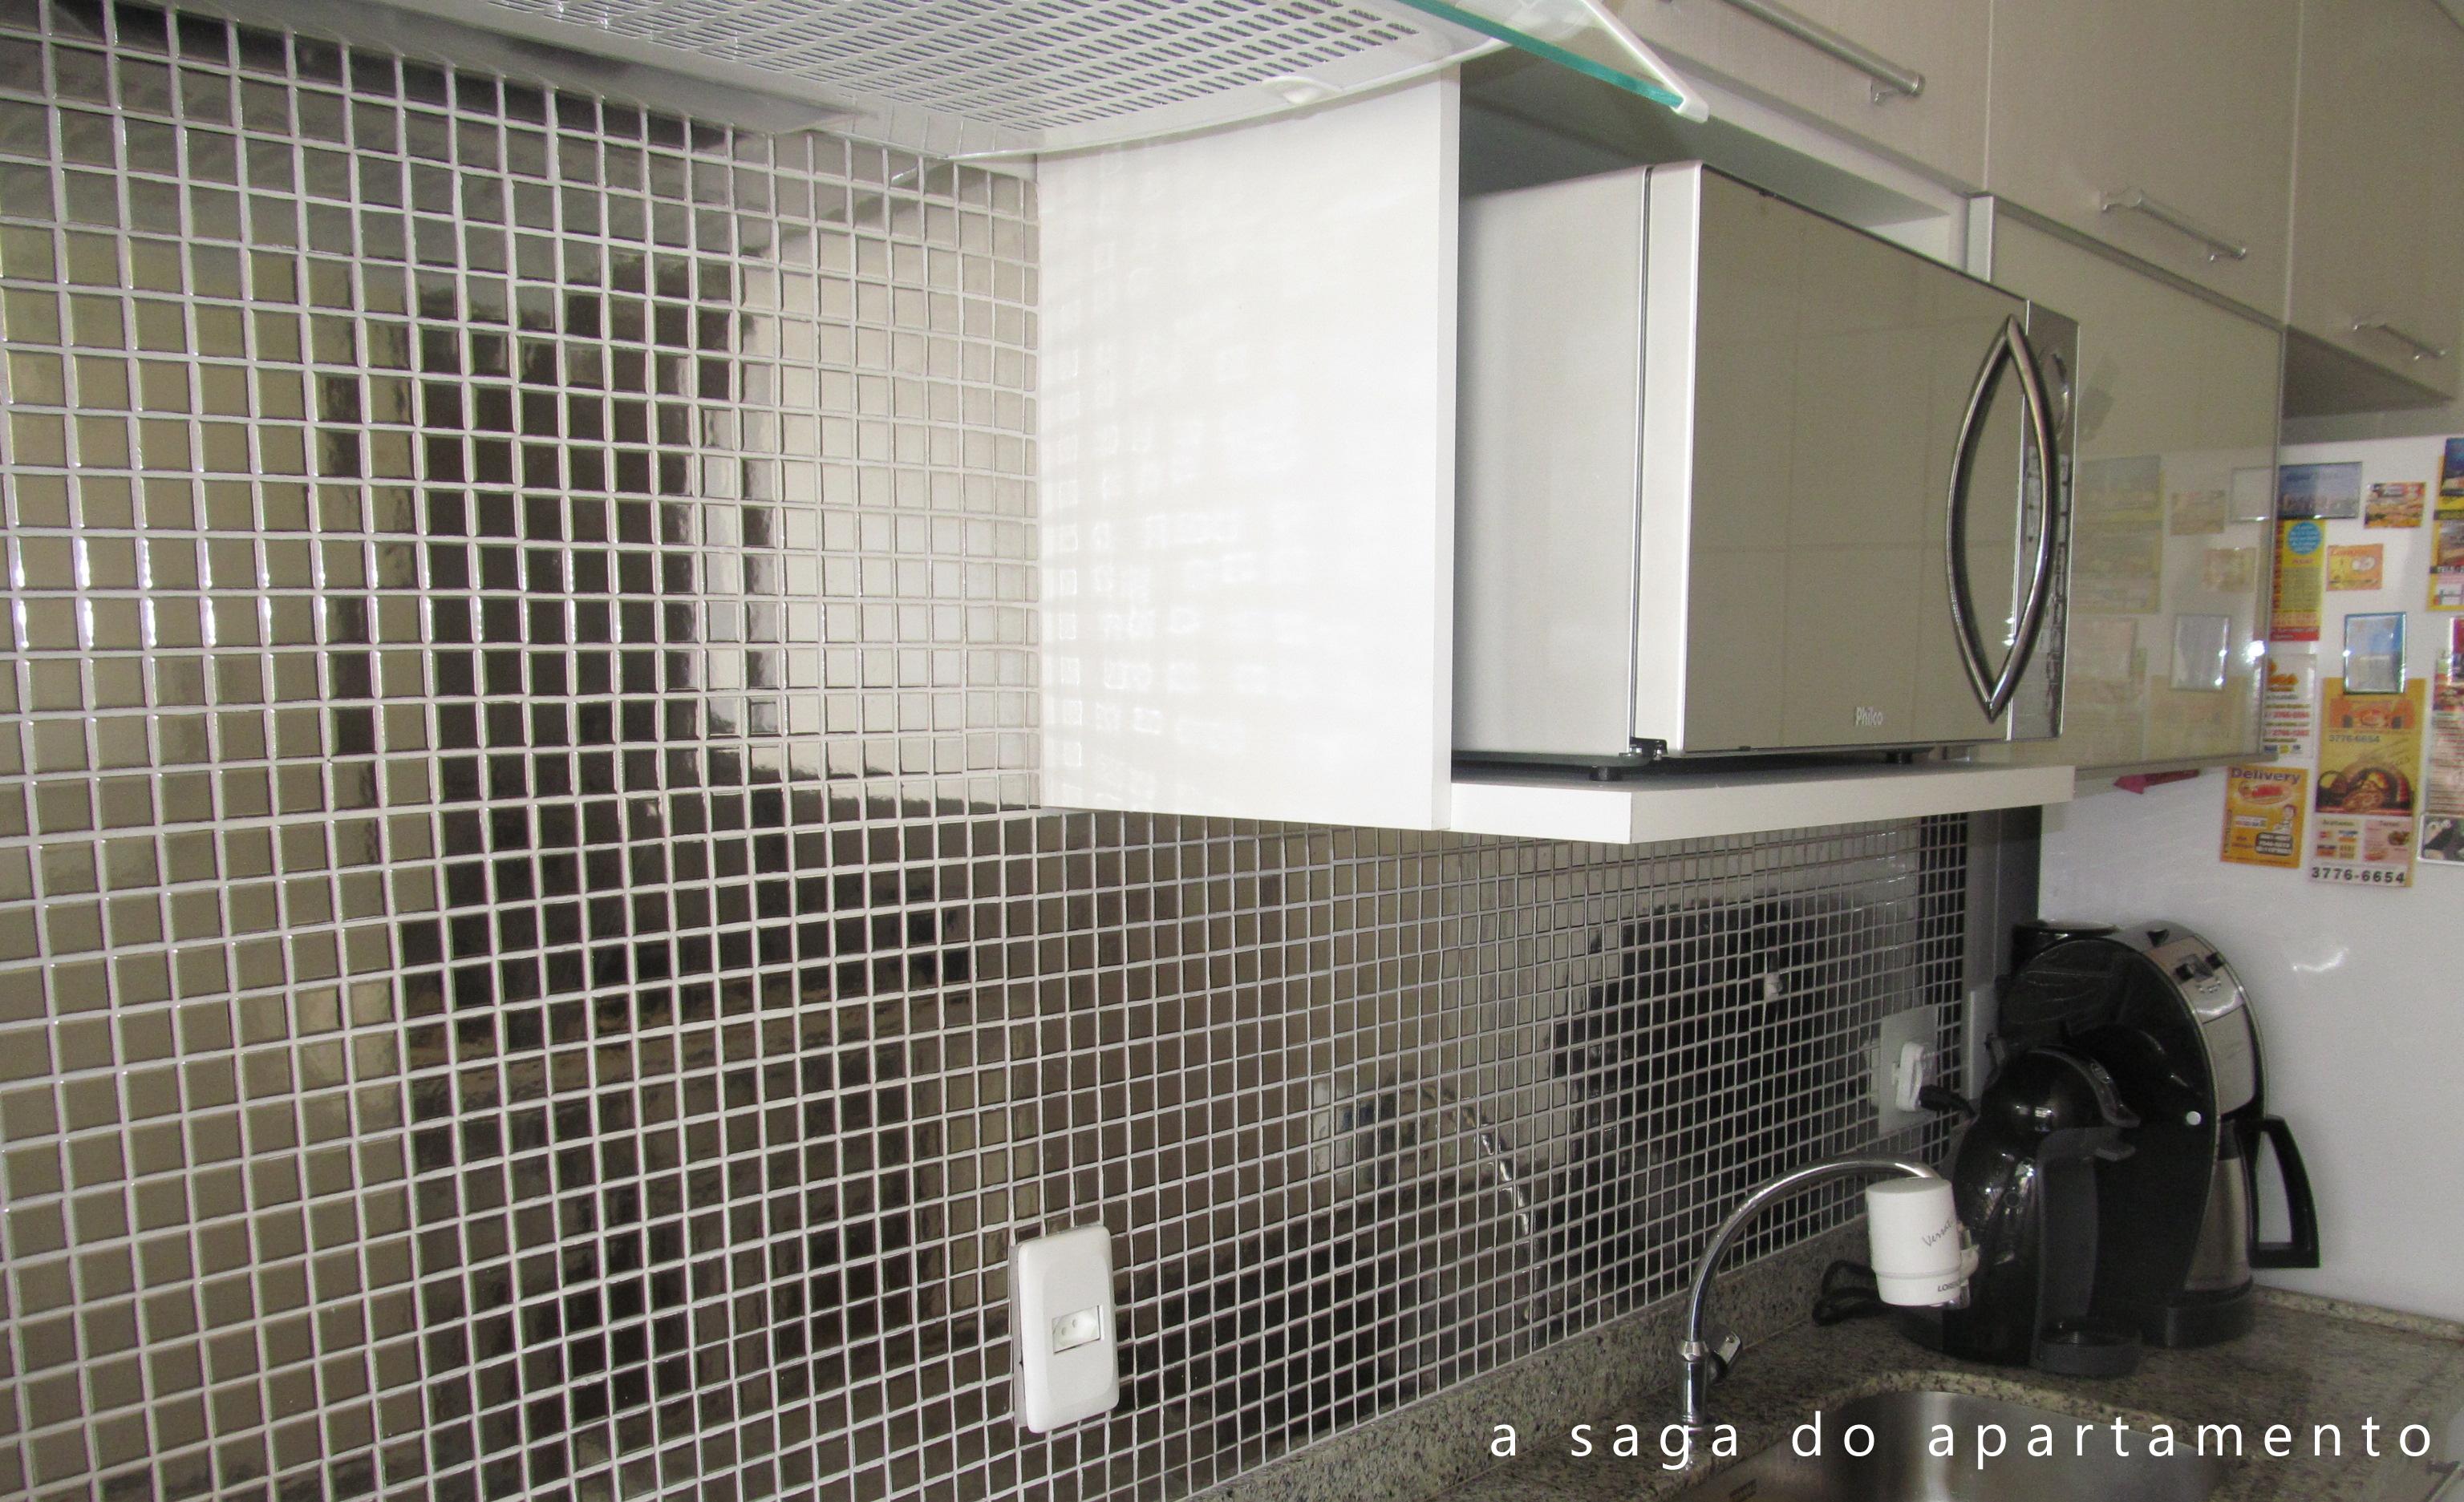 Pastilhas de Vidro parte 4: Pastilhas Inox na Cozinha #665F4D 3072 1873